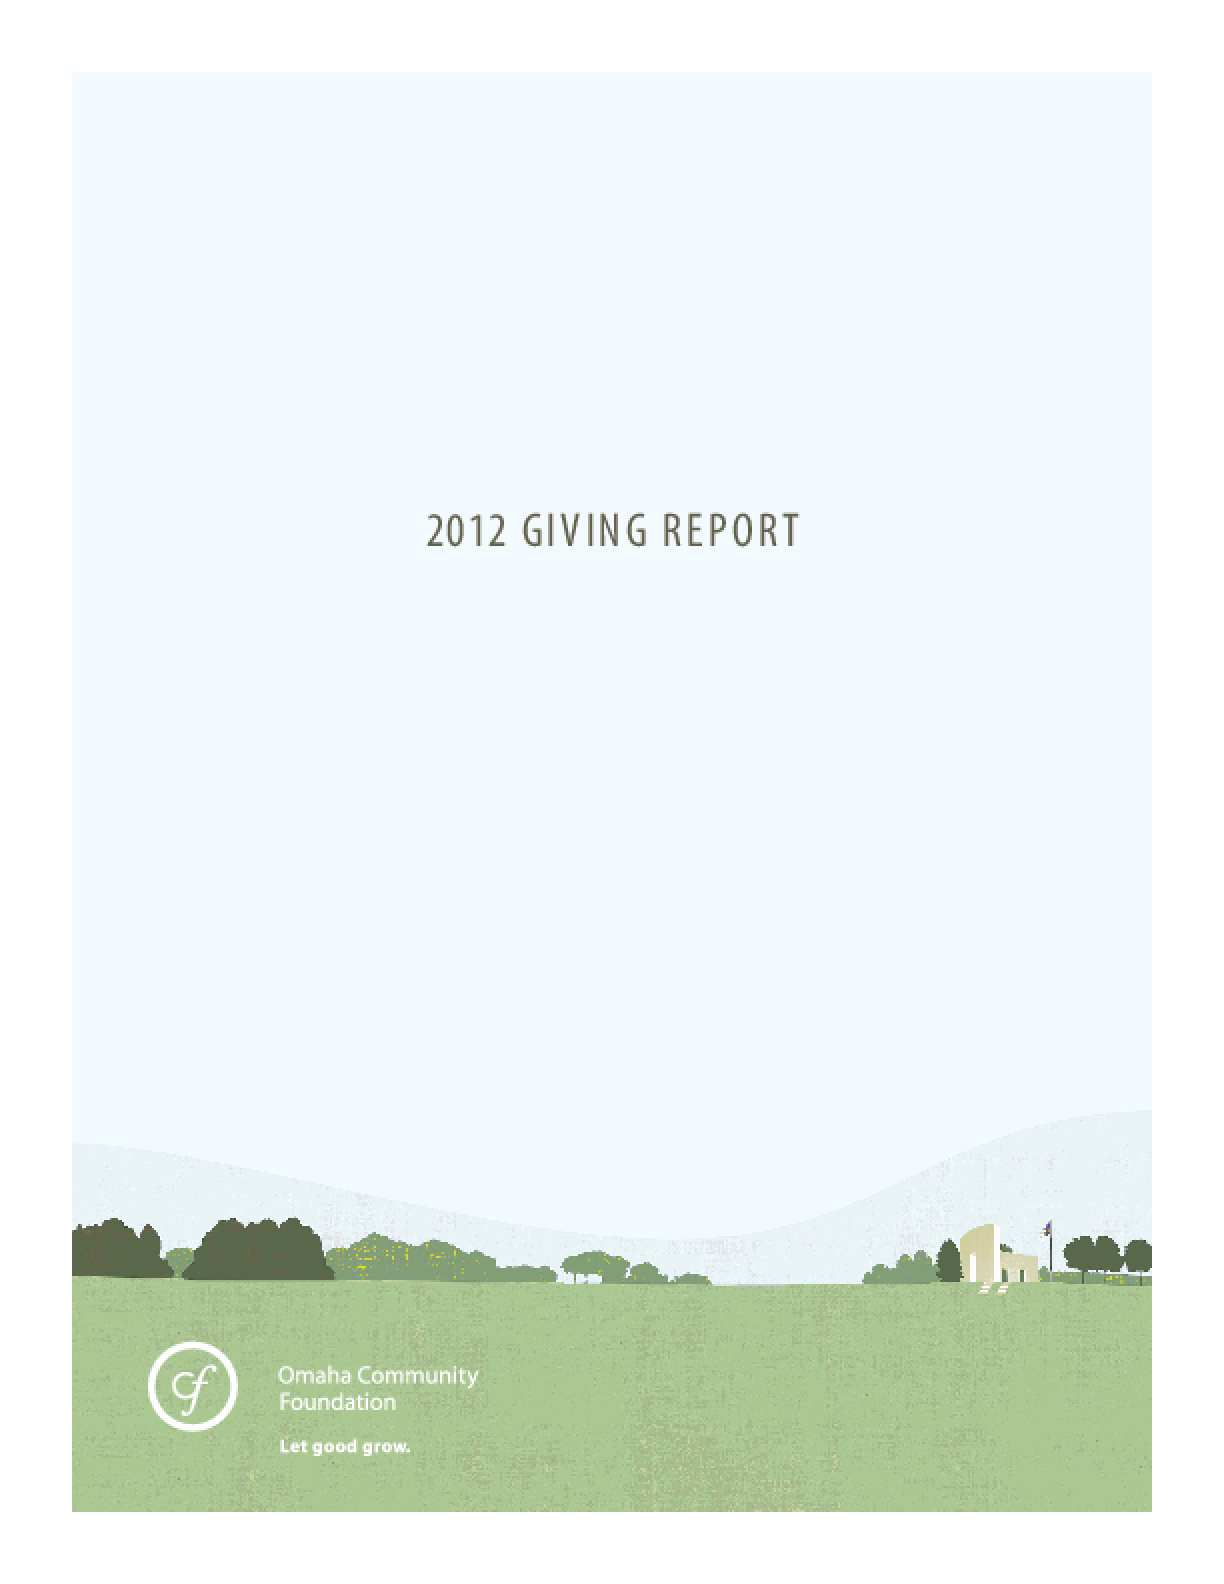 Omaha Community Foundation 2012 Giving Report